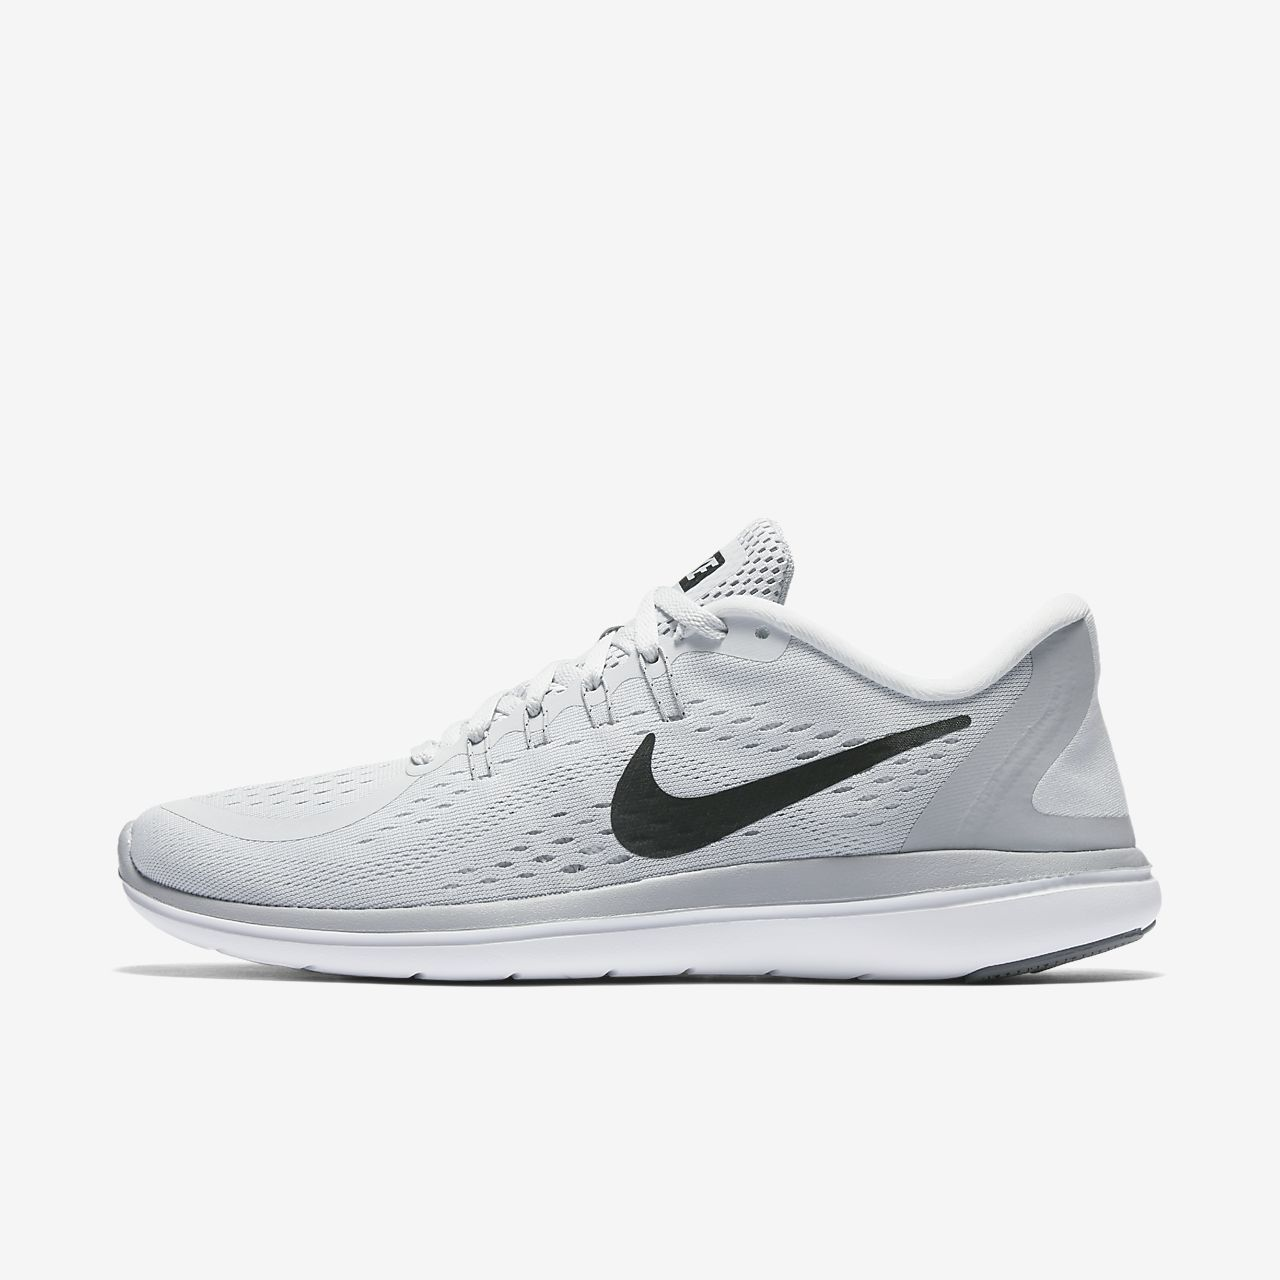 87e8cd3031c9 Nike Flex 2017 RN Women s Running Shoe